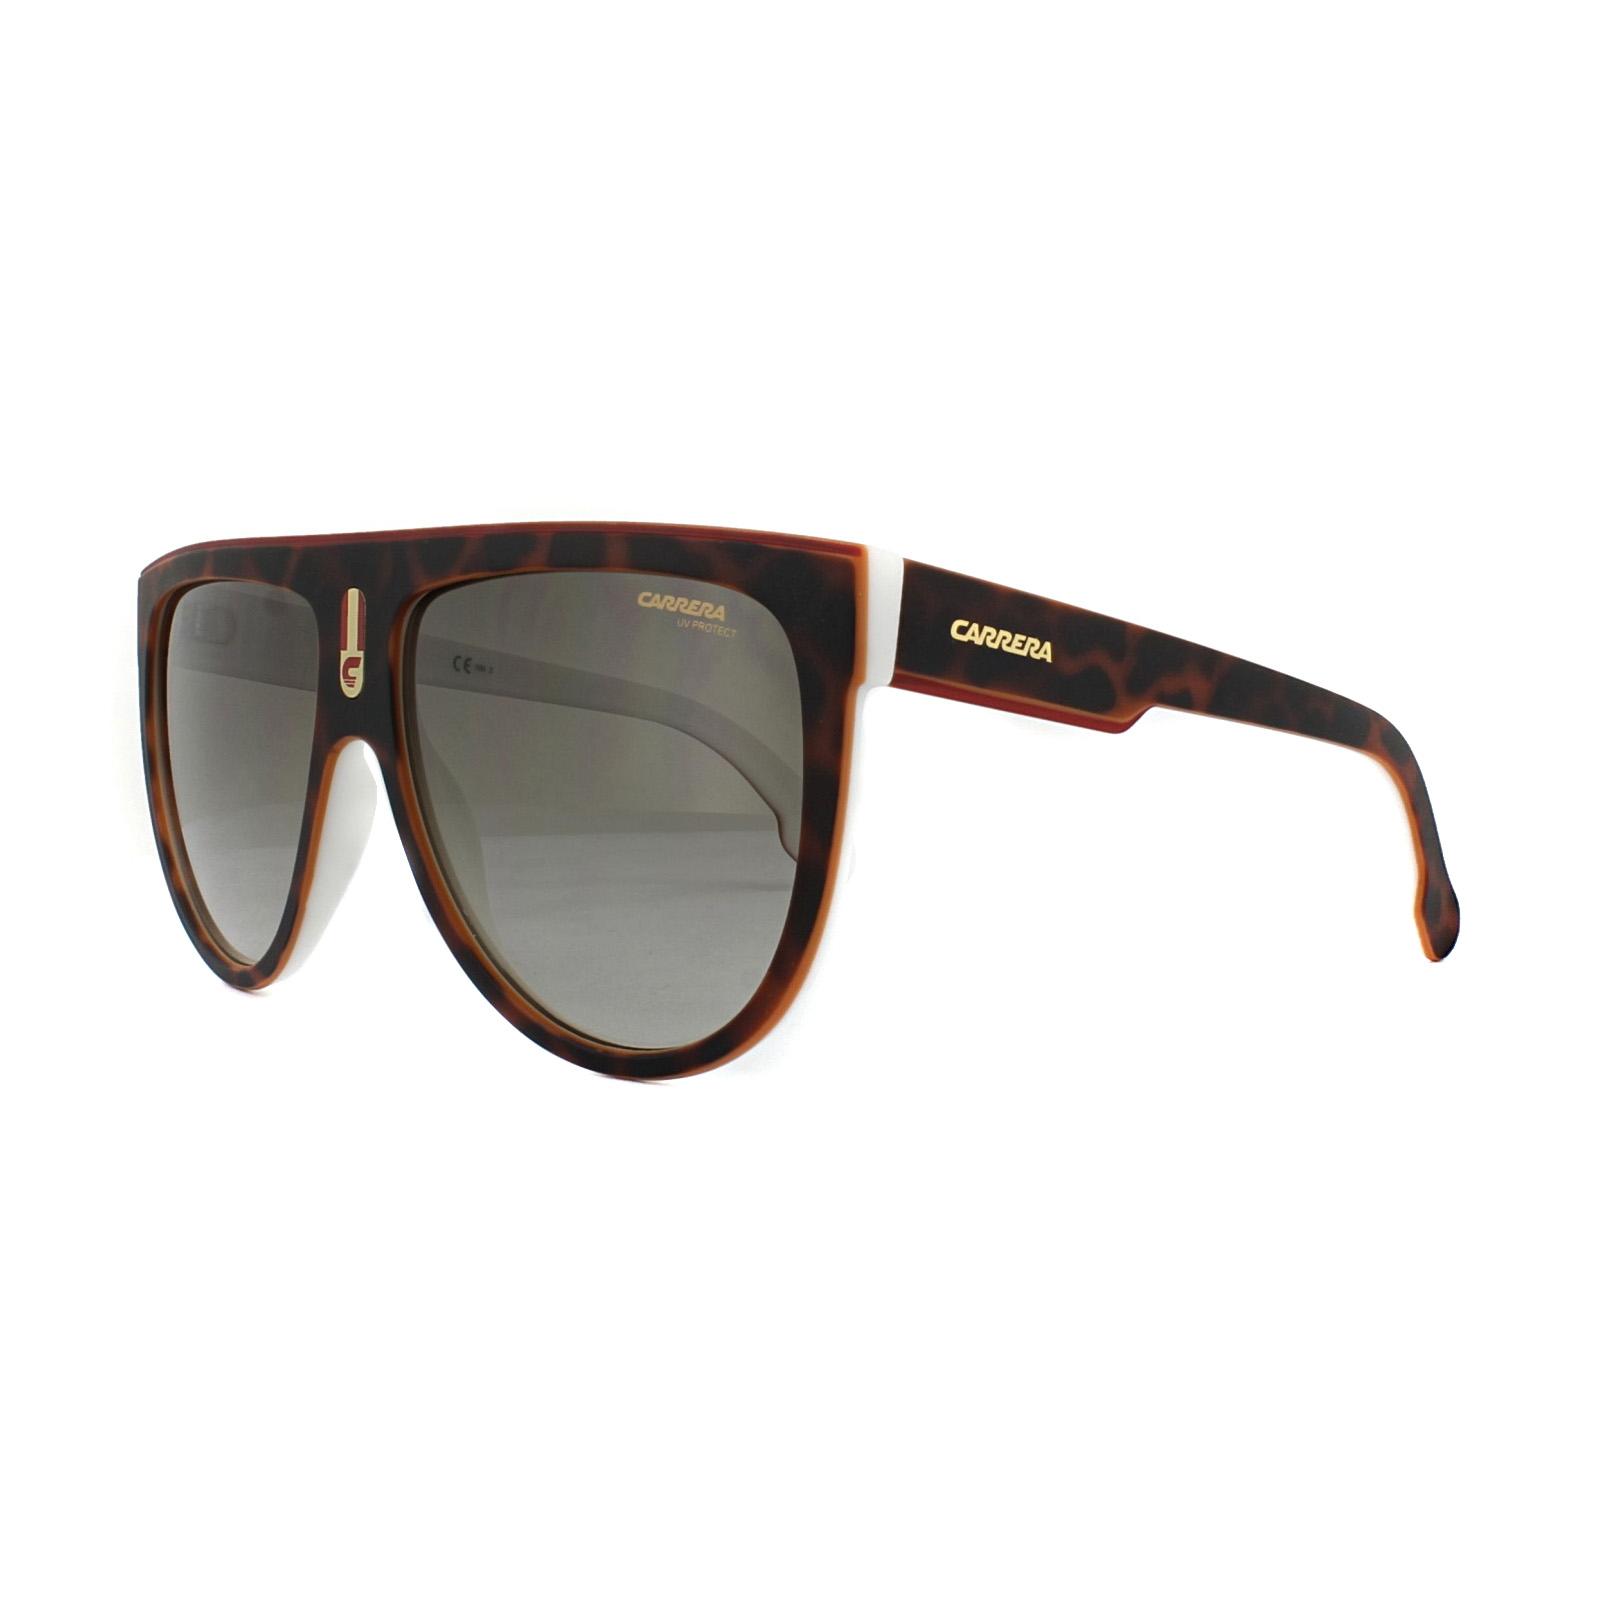 e08aaa99878 Sentinel Carrera Sunglasses Flagtop C9K HA Orange Havana White Brown  Gradient